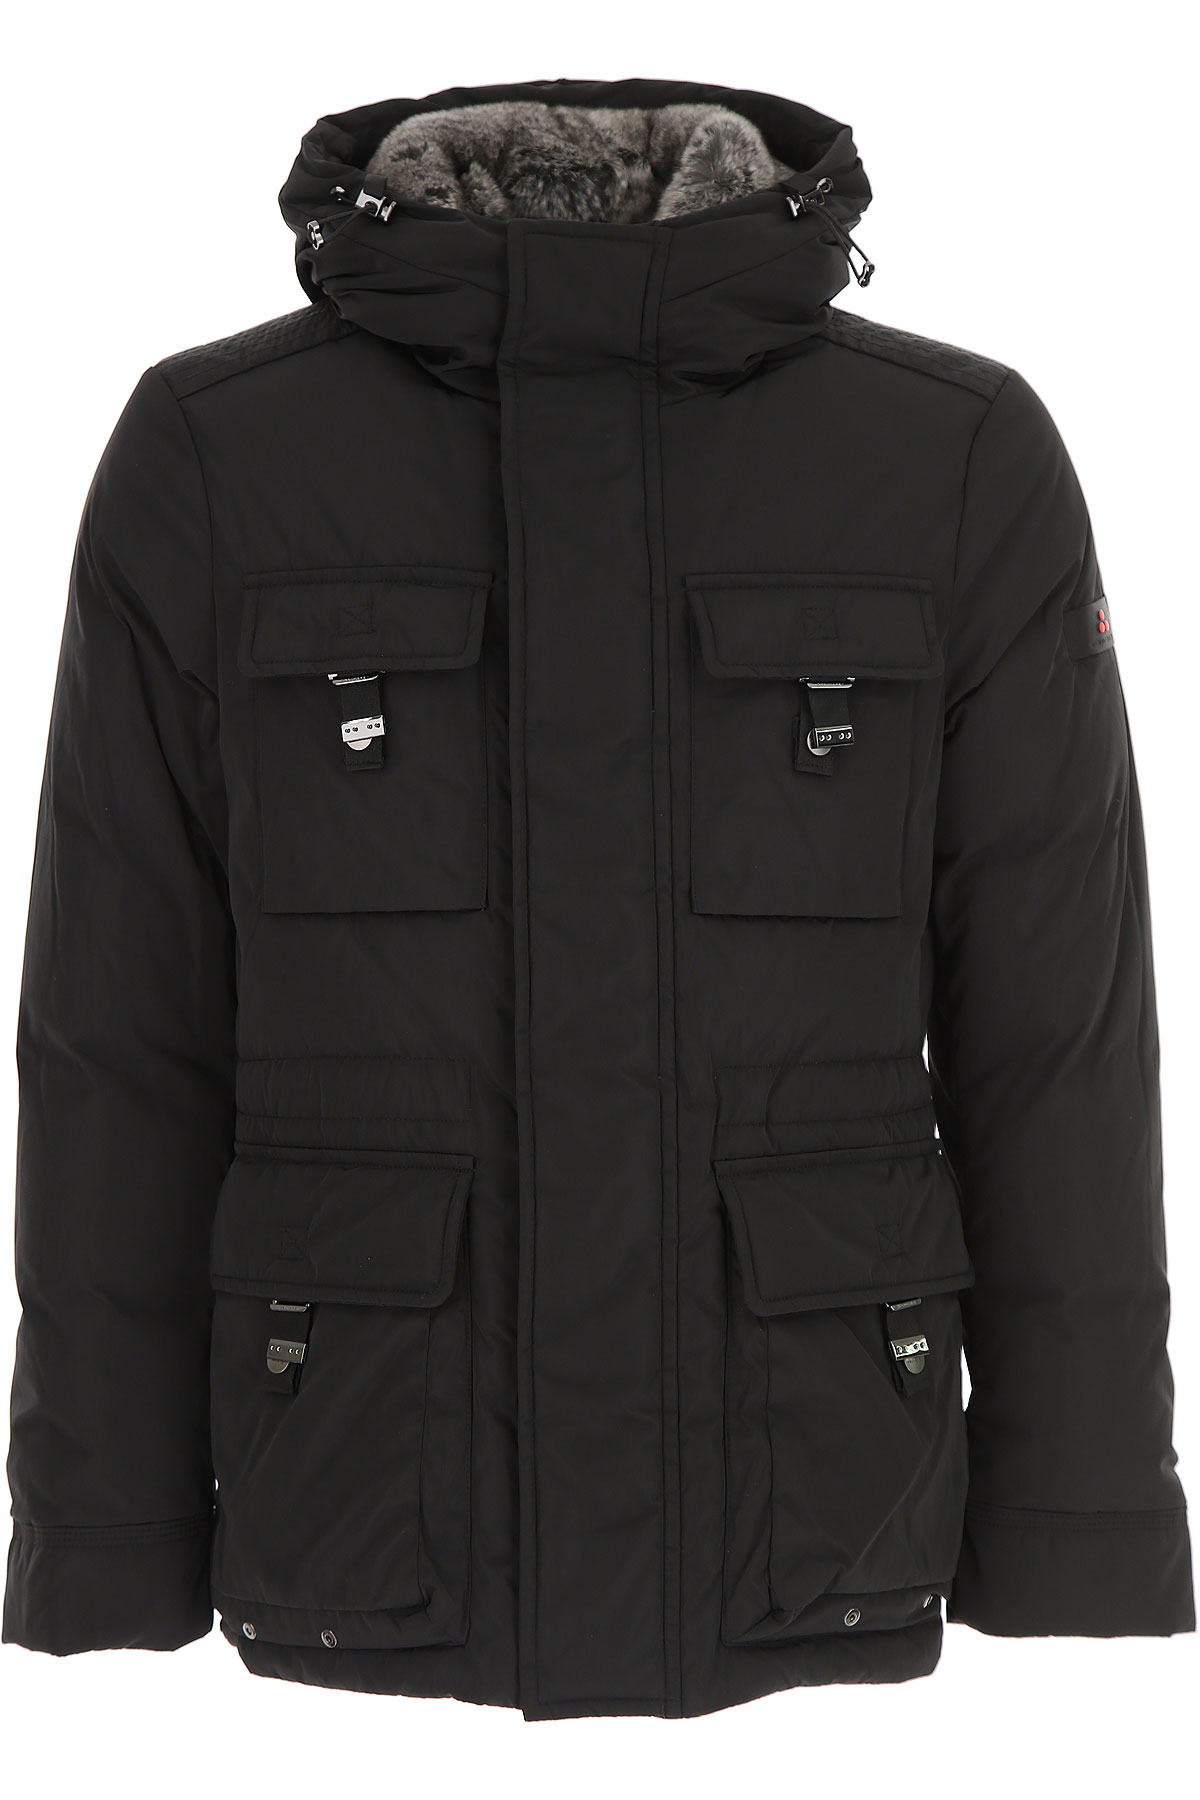 Peuterey Down Jacket for Men, Puffer Ski Jacket, Black, Down, 2019, L M XL XXL